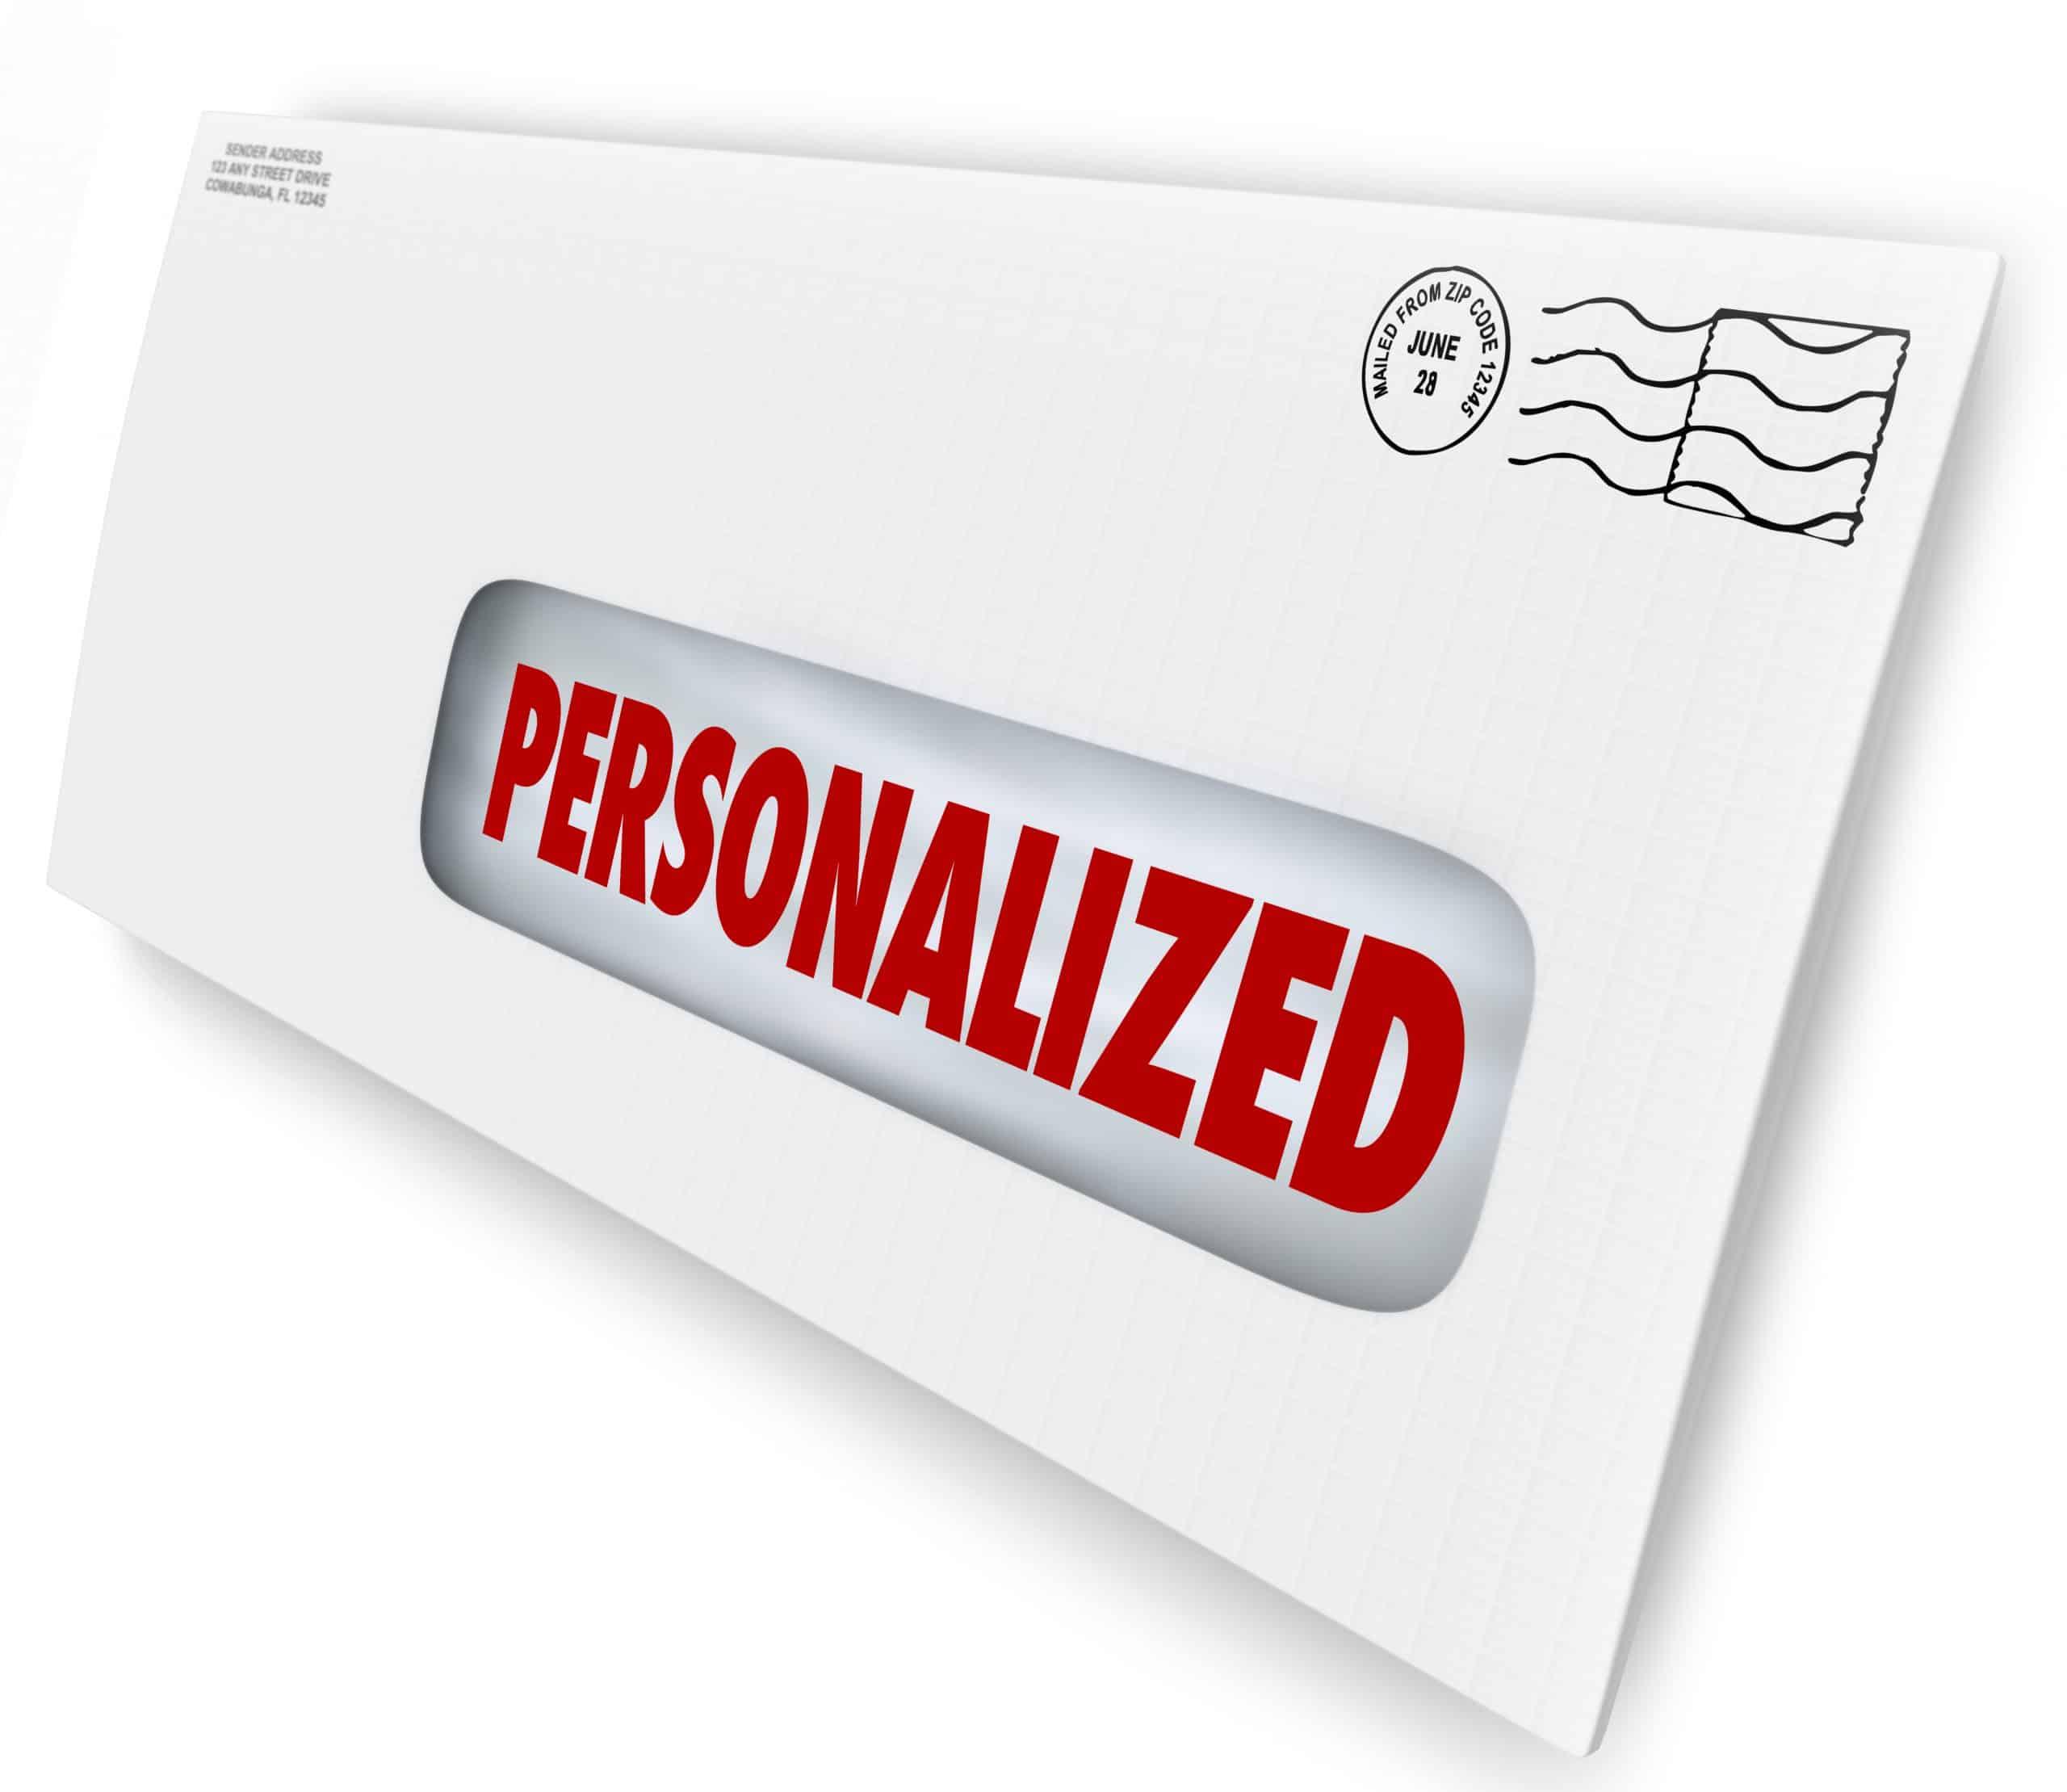 Personalized SMS Marketing